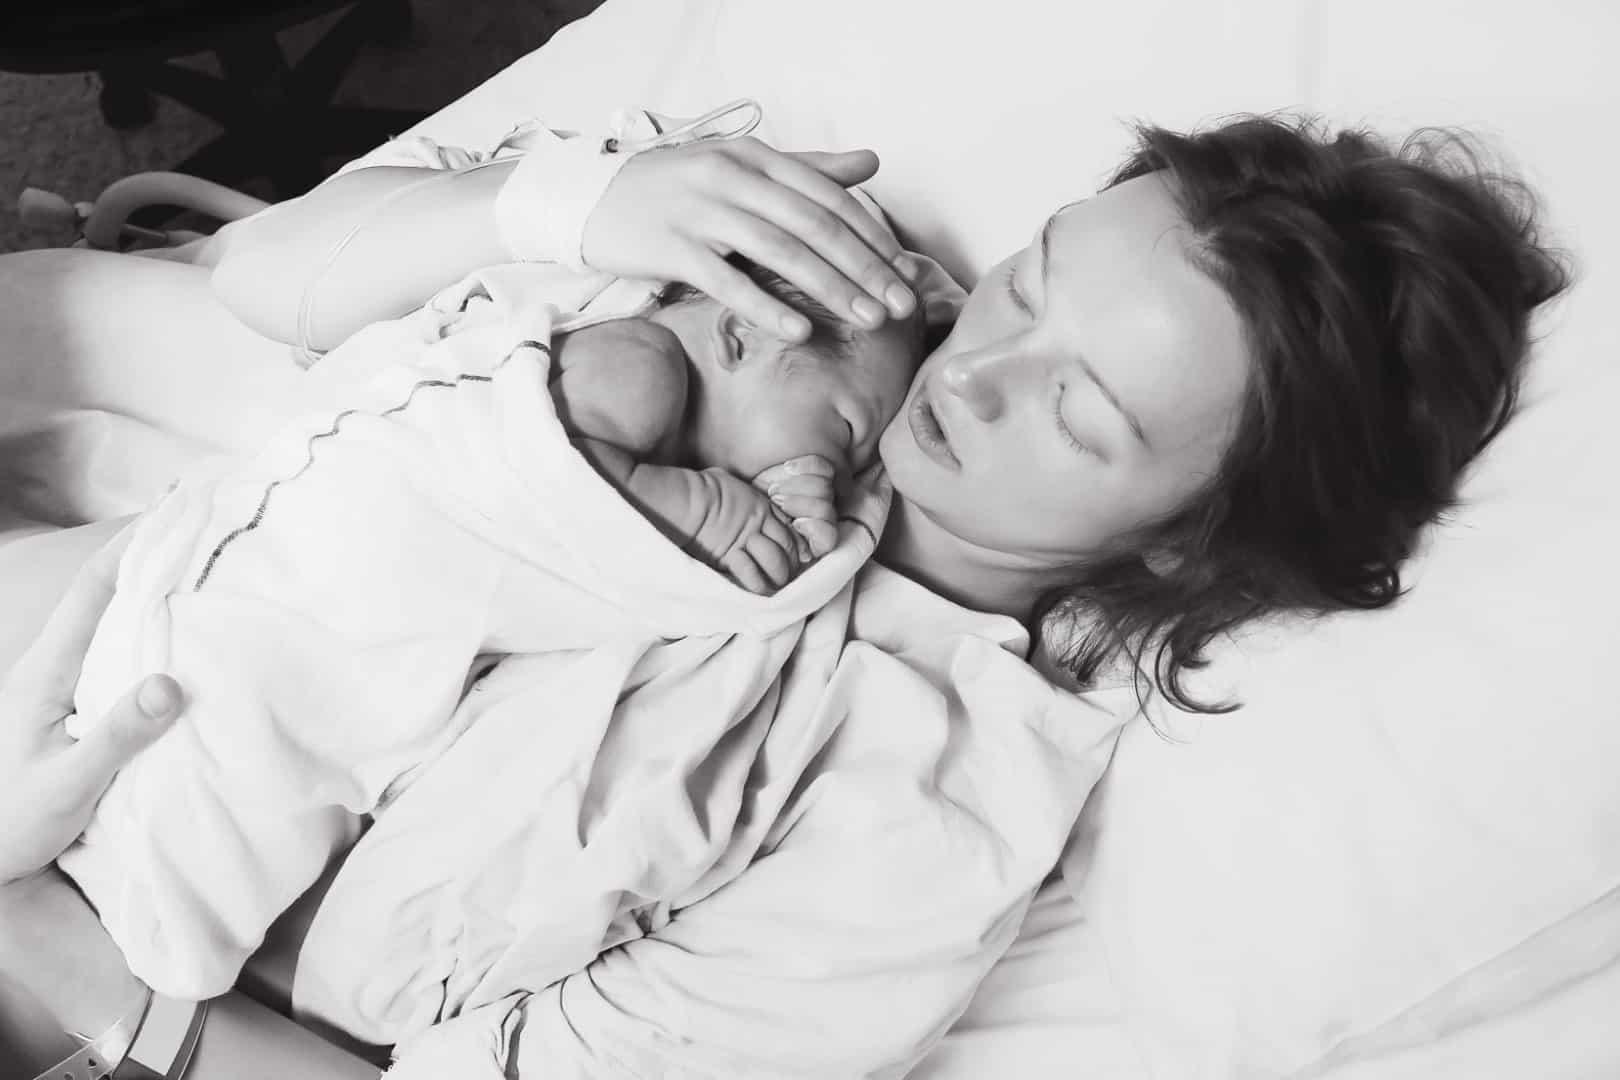 Hire a Birth & Postpartum Doula - Emily Edgar Doula